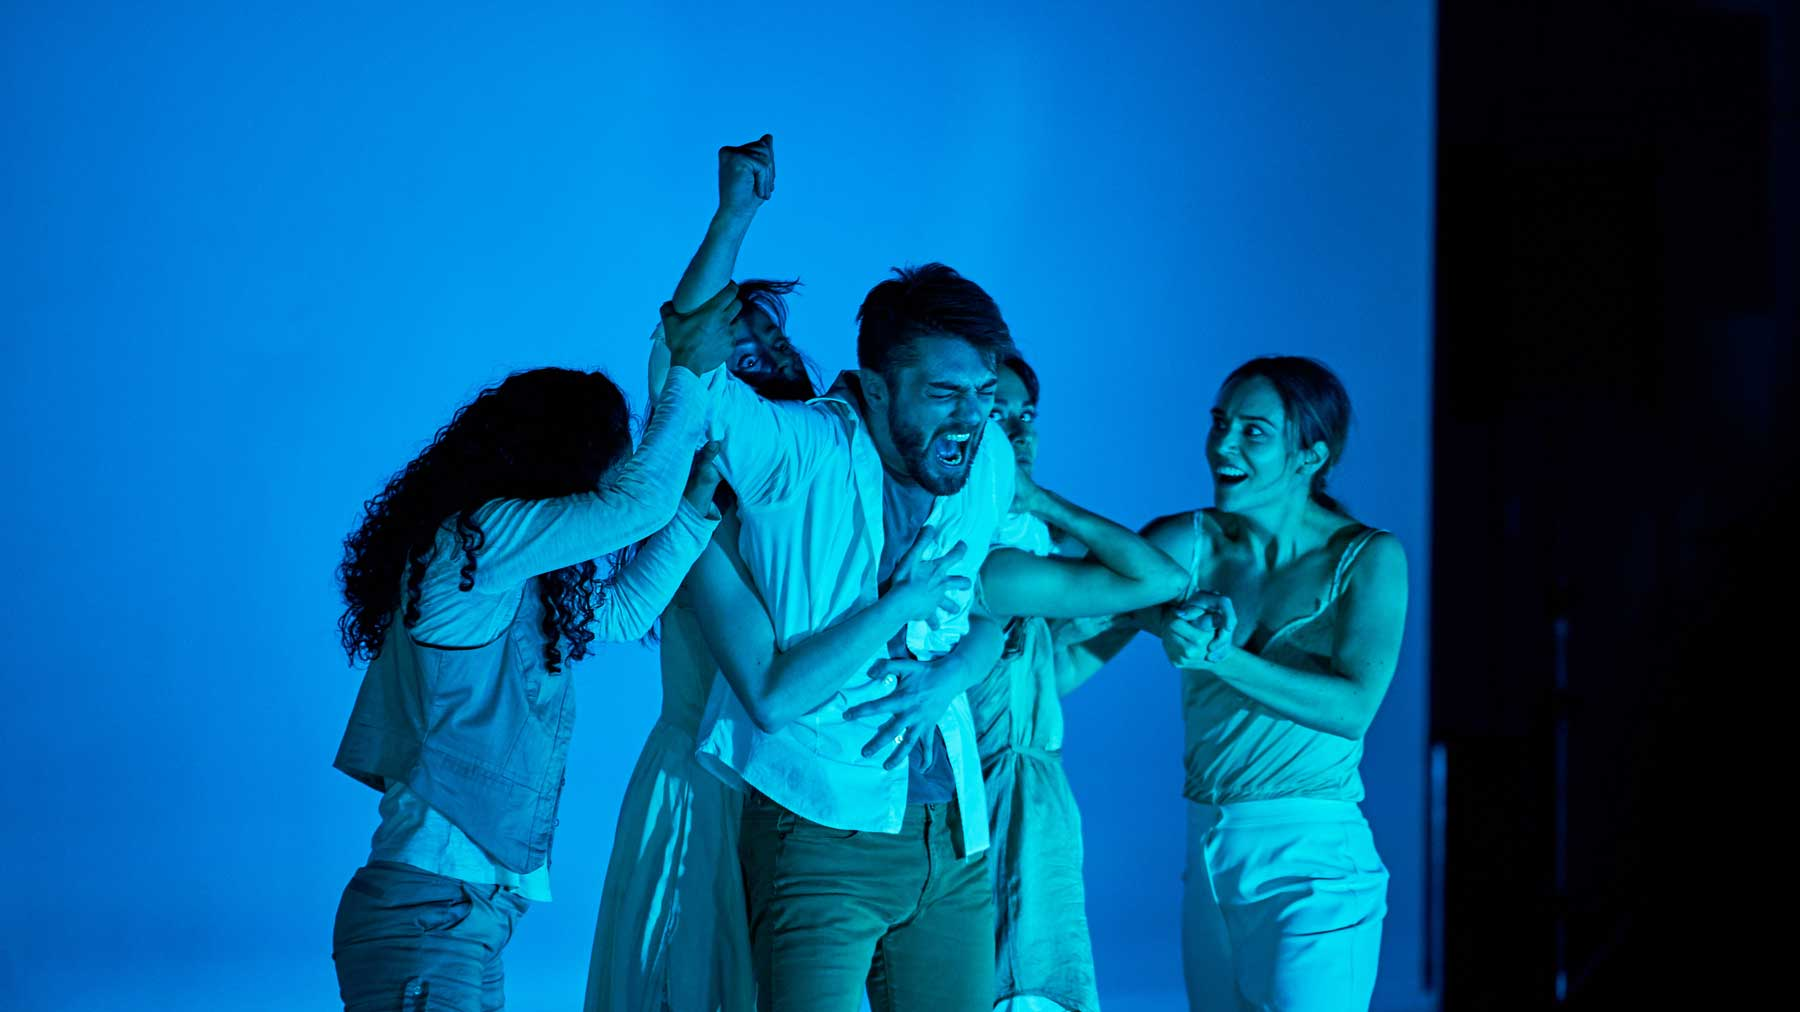 mardi-culturel-td-danse-danse-kyra-jean-green-trip-the-light-fantastic-15.jpg